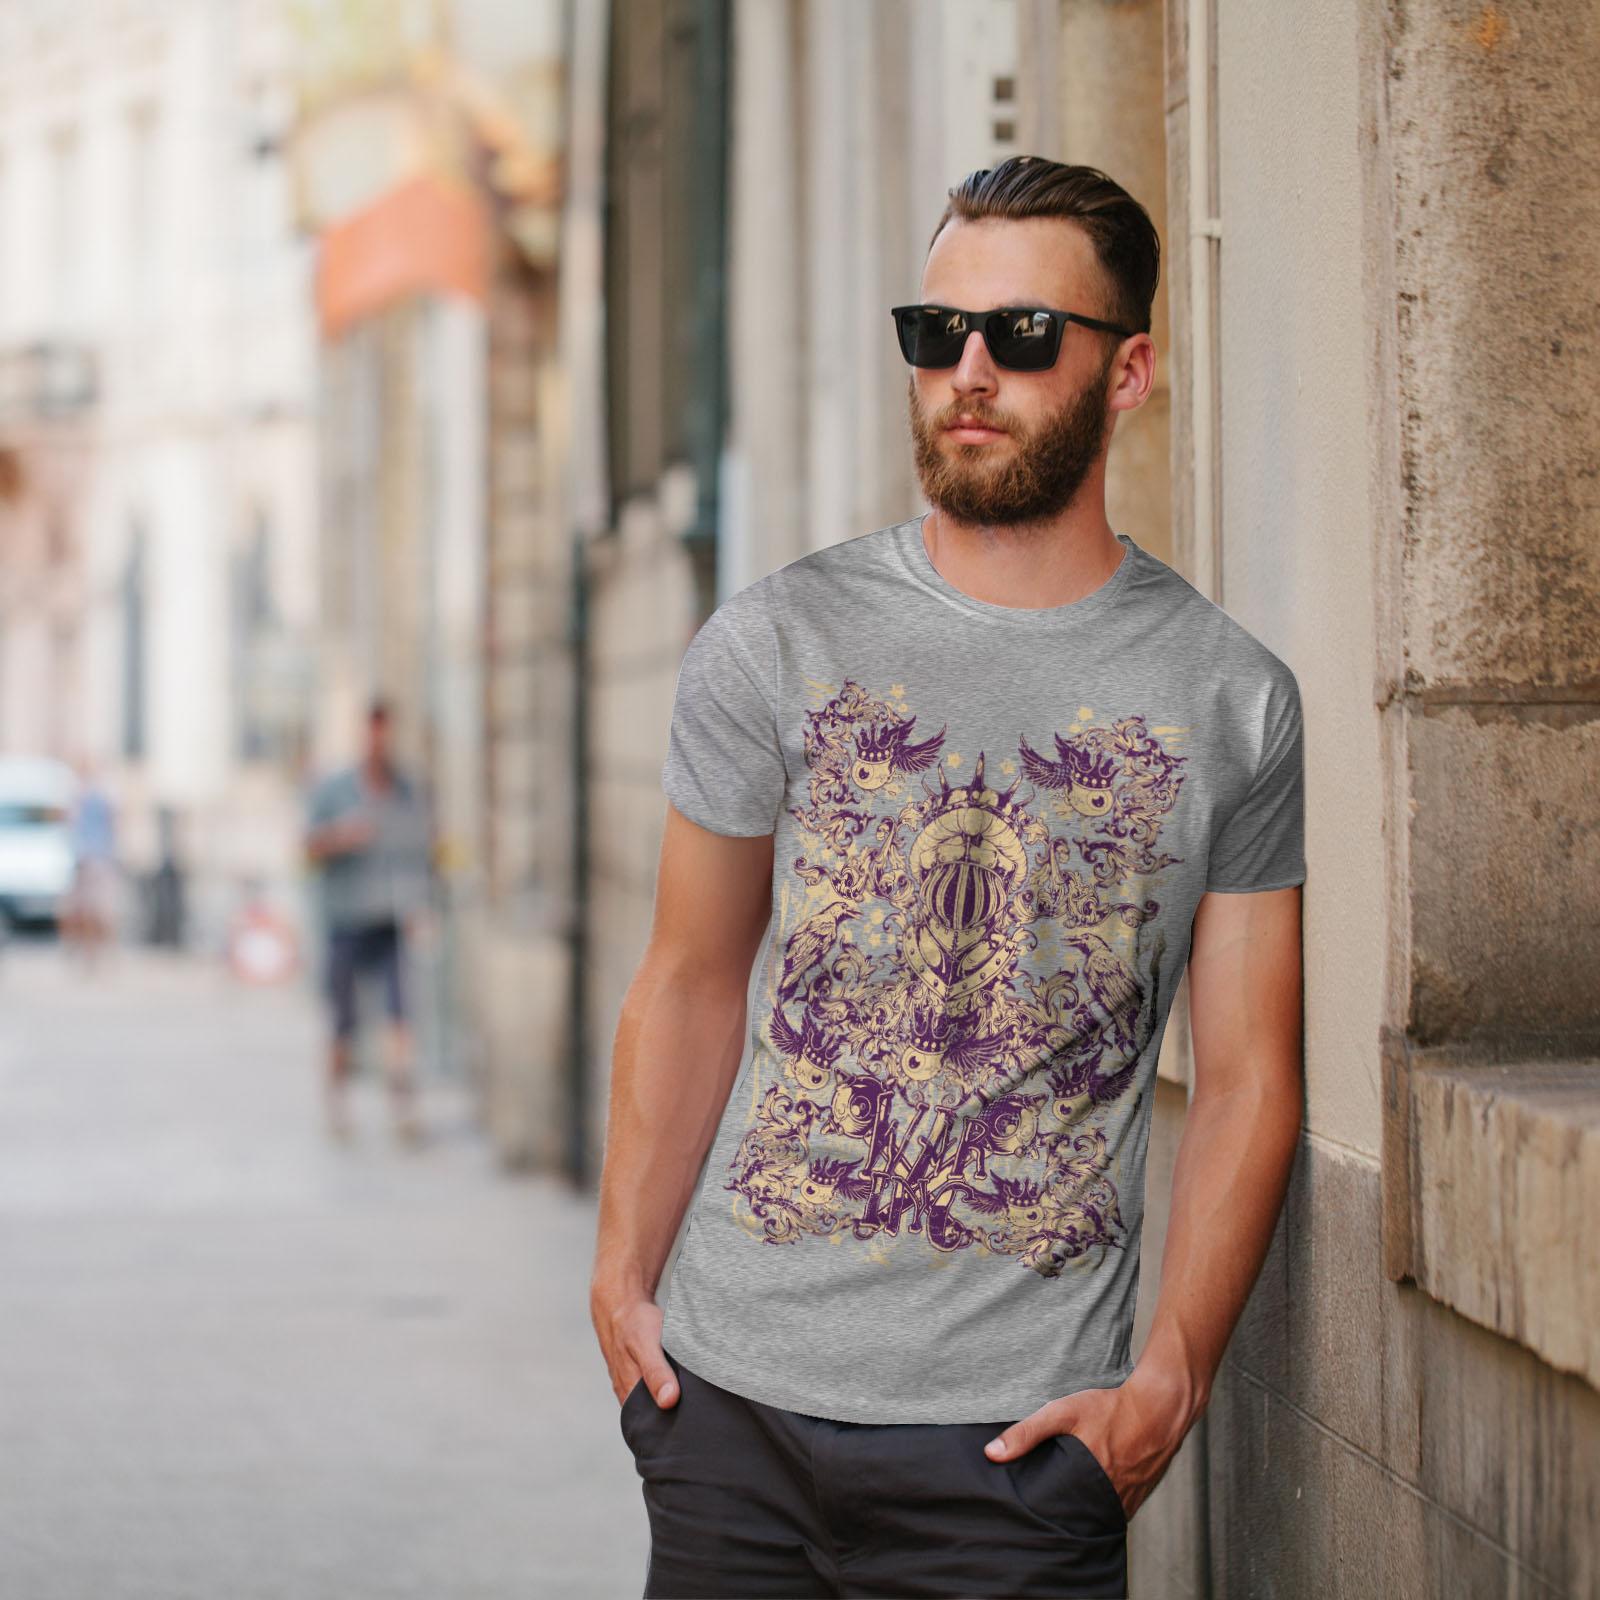 Wellcoda-War-Inc-Zombie-Mens-T-shirt-Monster-Graphic-Design-Printed-Tee thumbnail 17